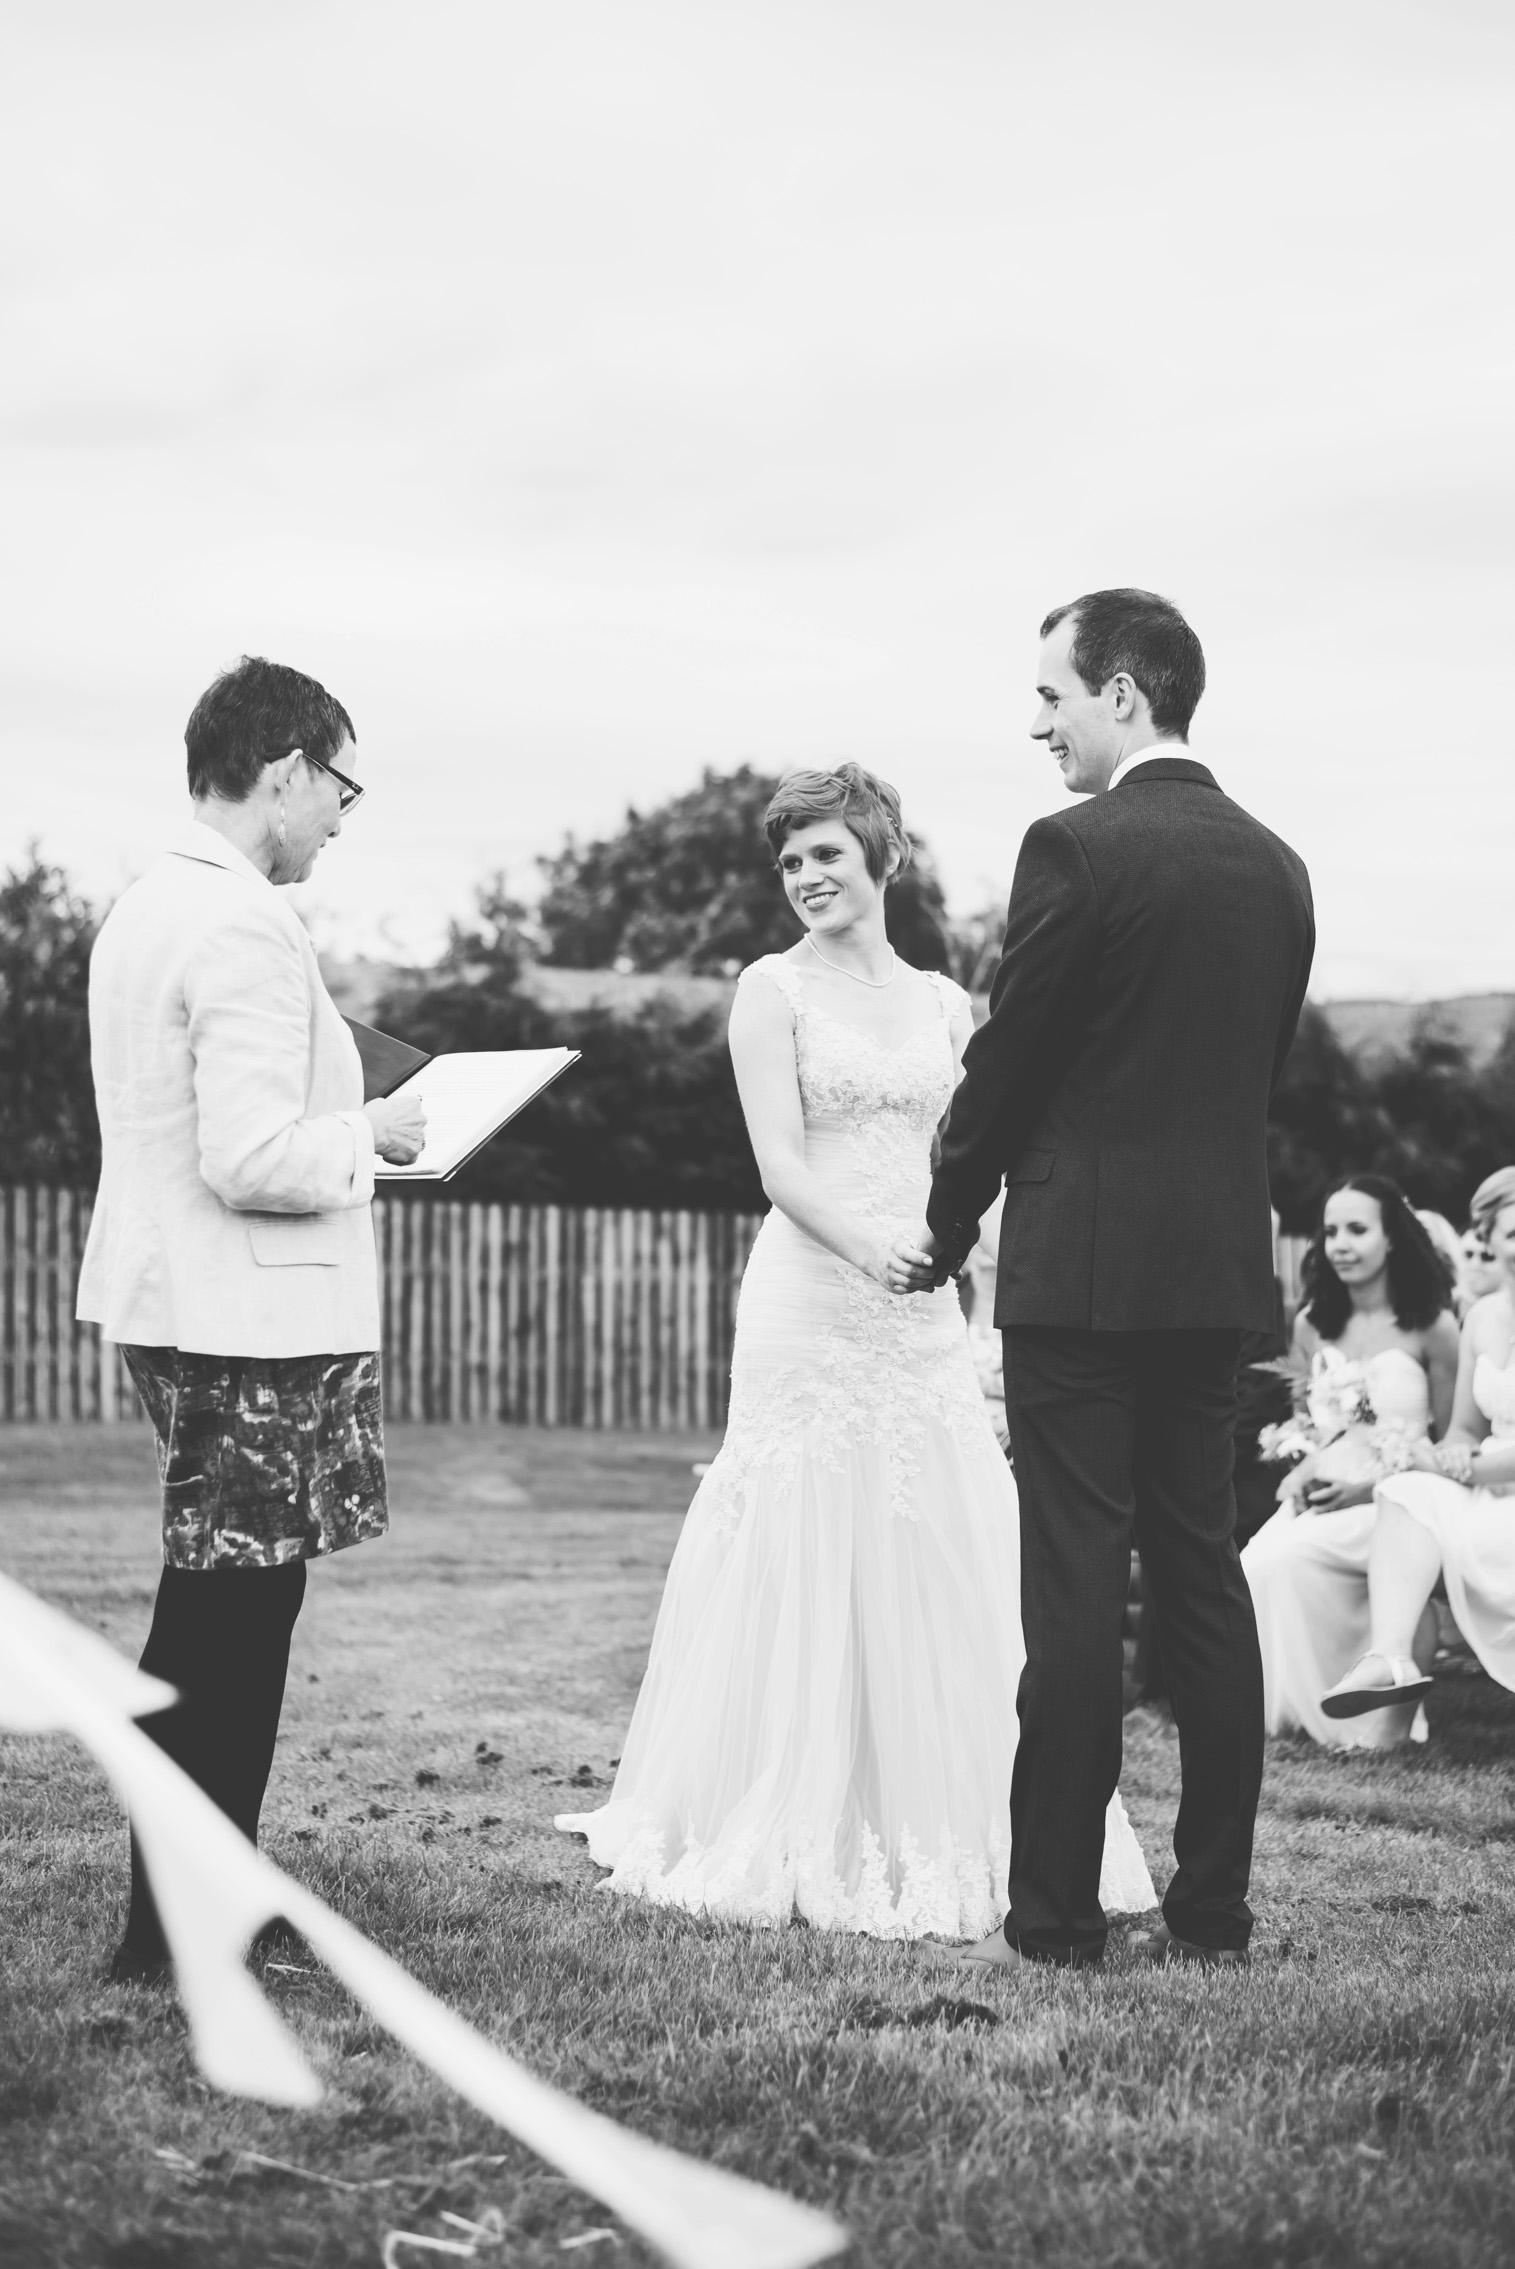 Peak+district+farm+wedding+lower+damgate+photographer-122.jpg